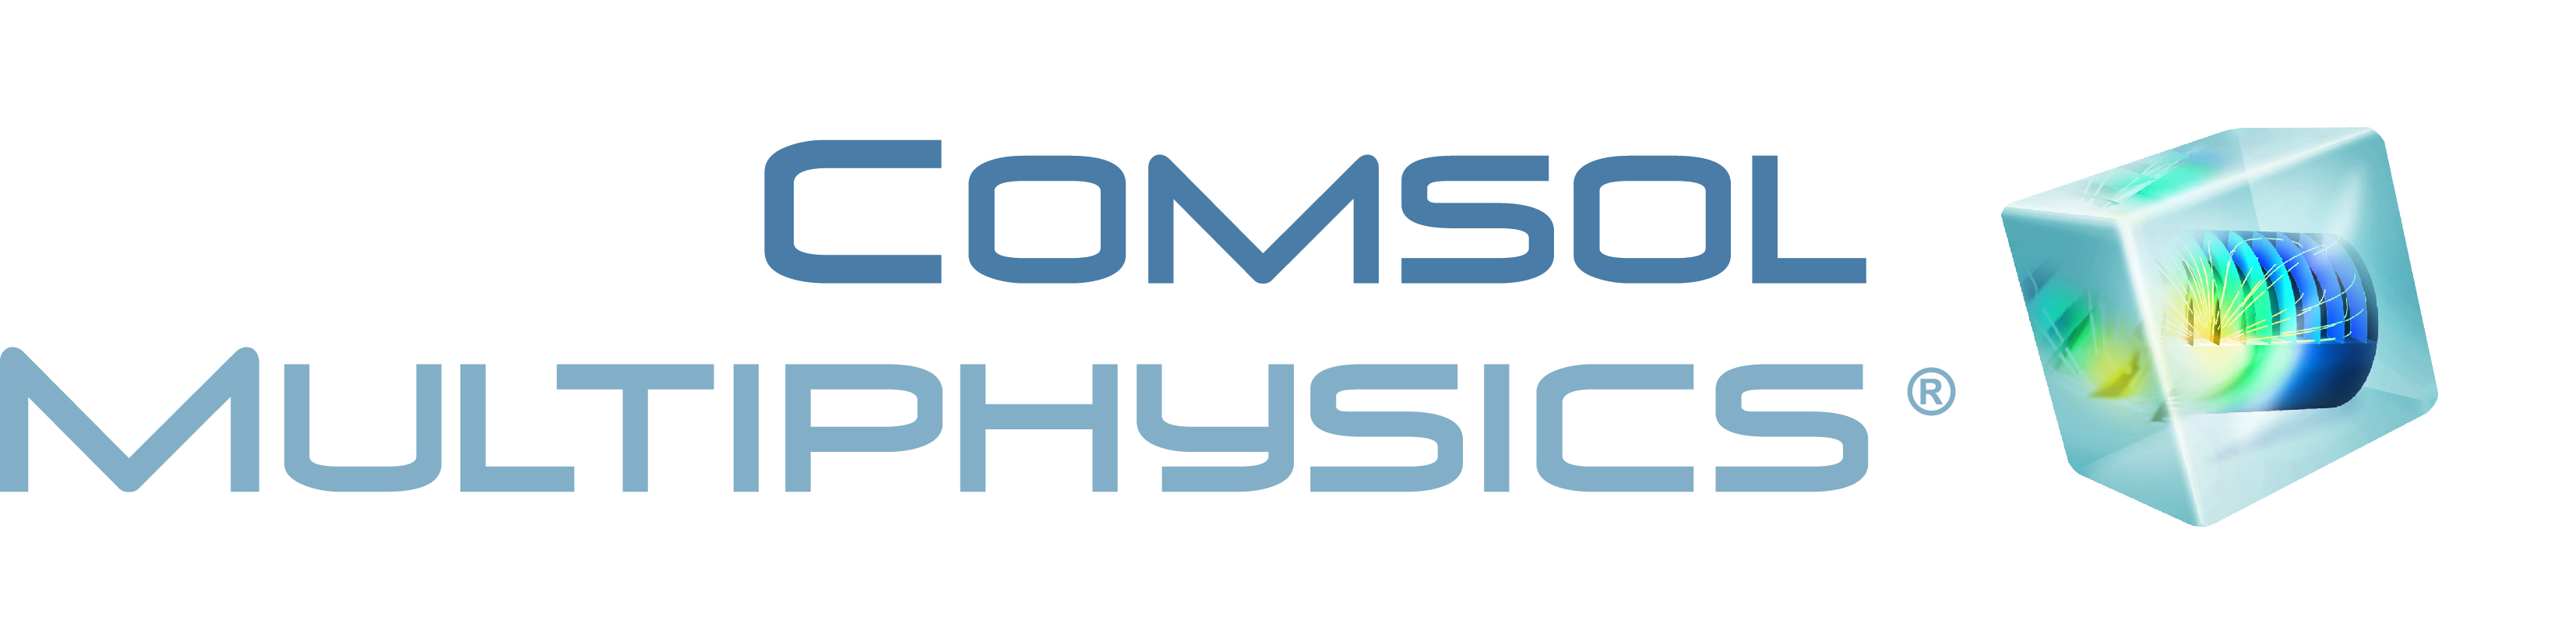 COMSOL MULTIPHYSICS 3.2A (4 cds)